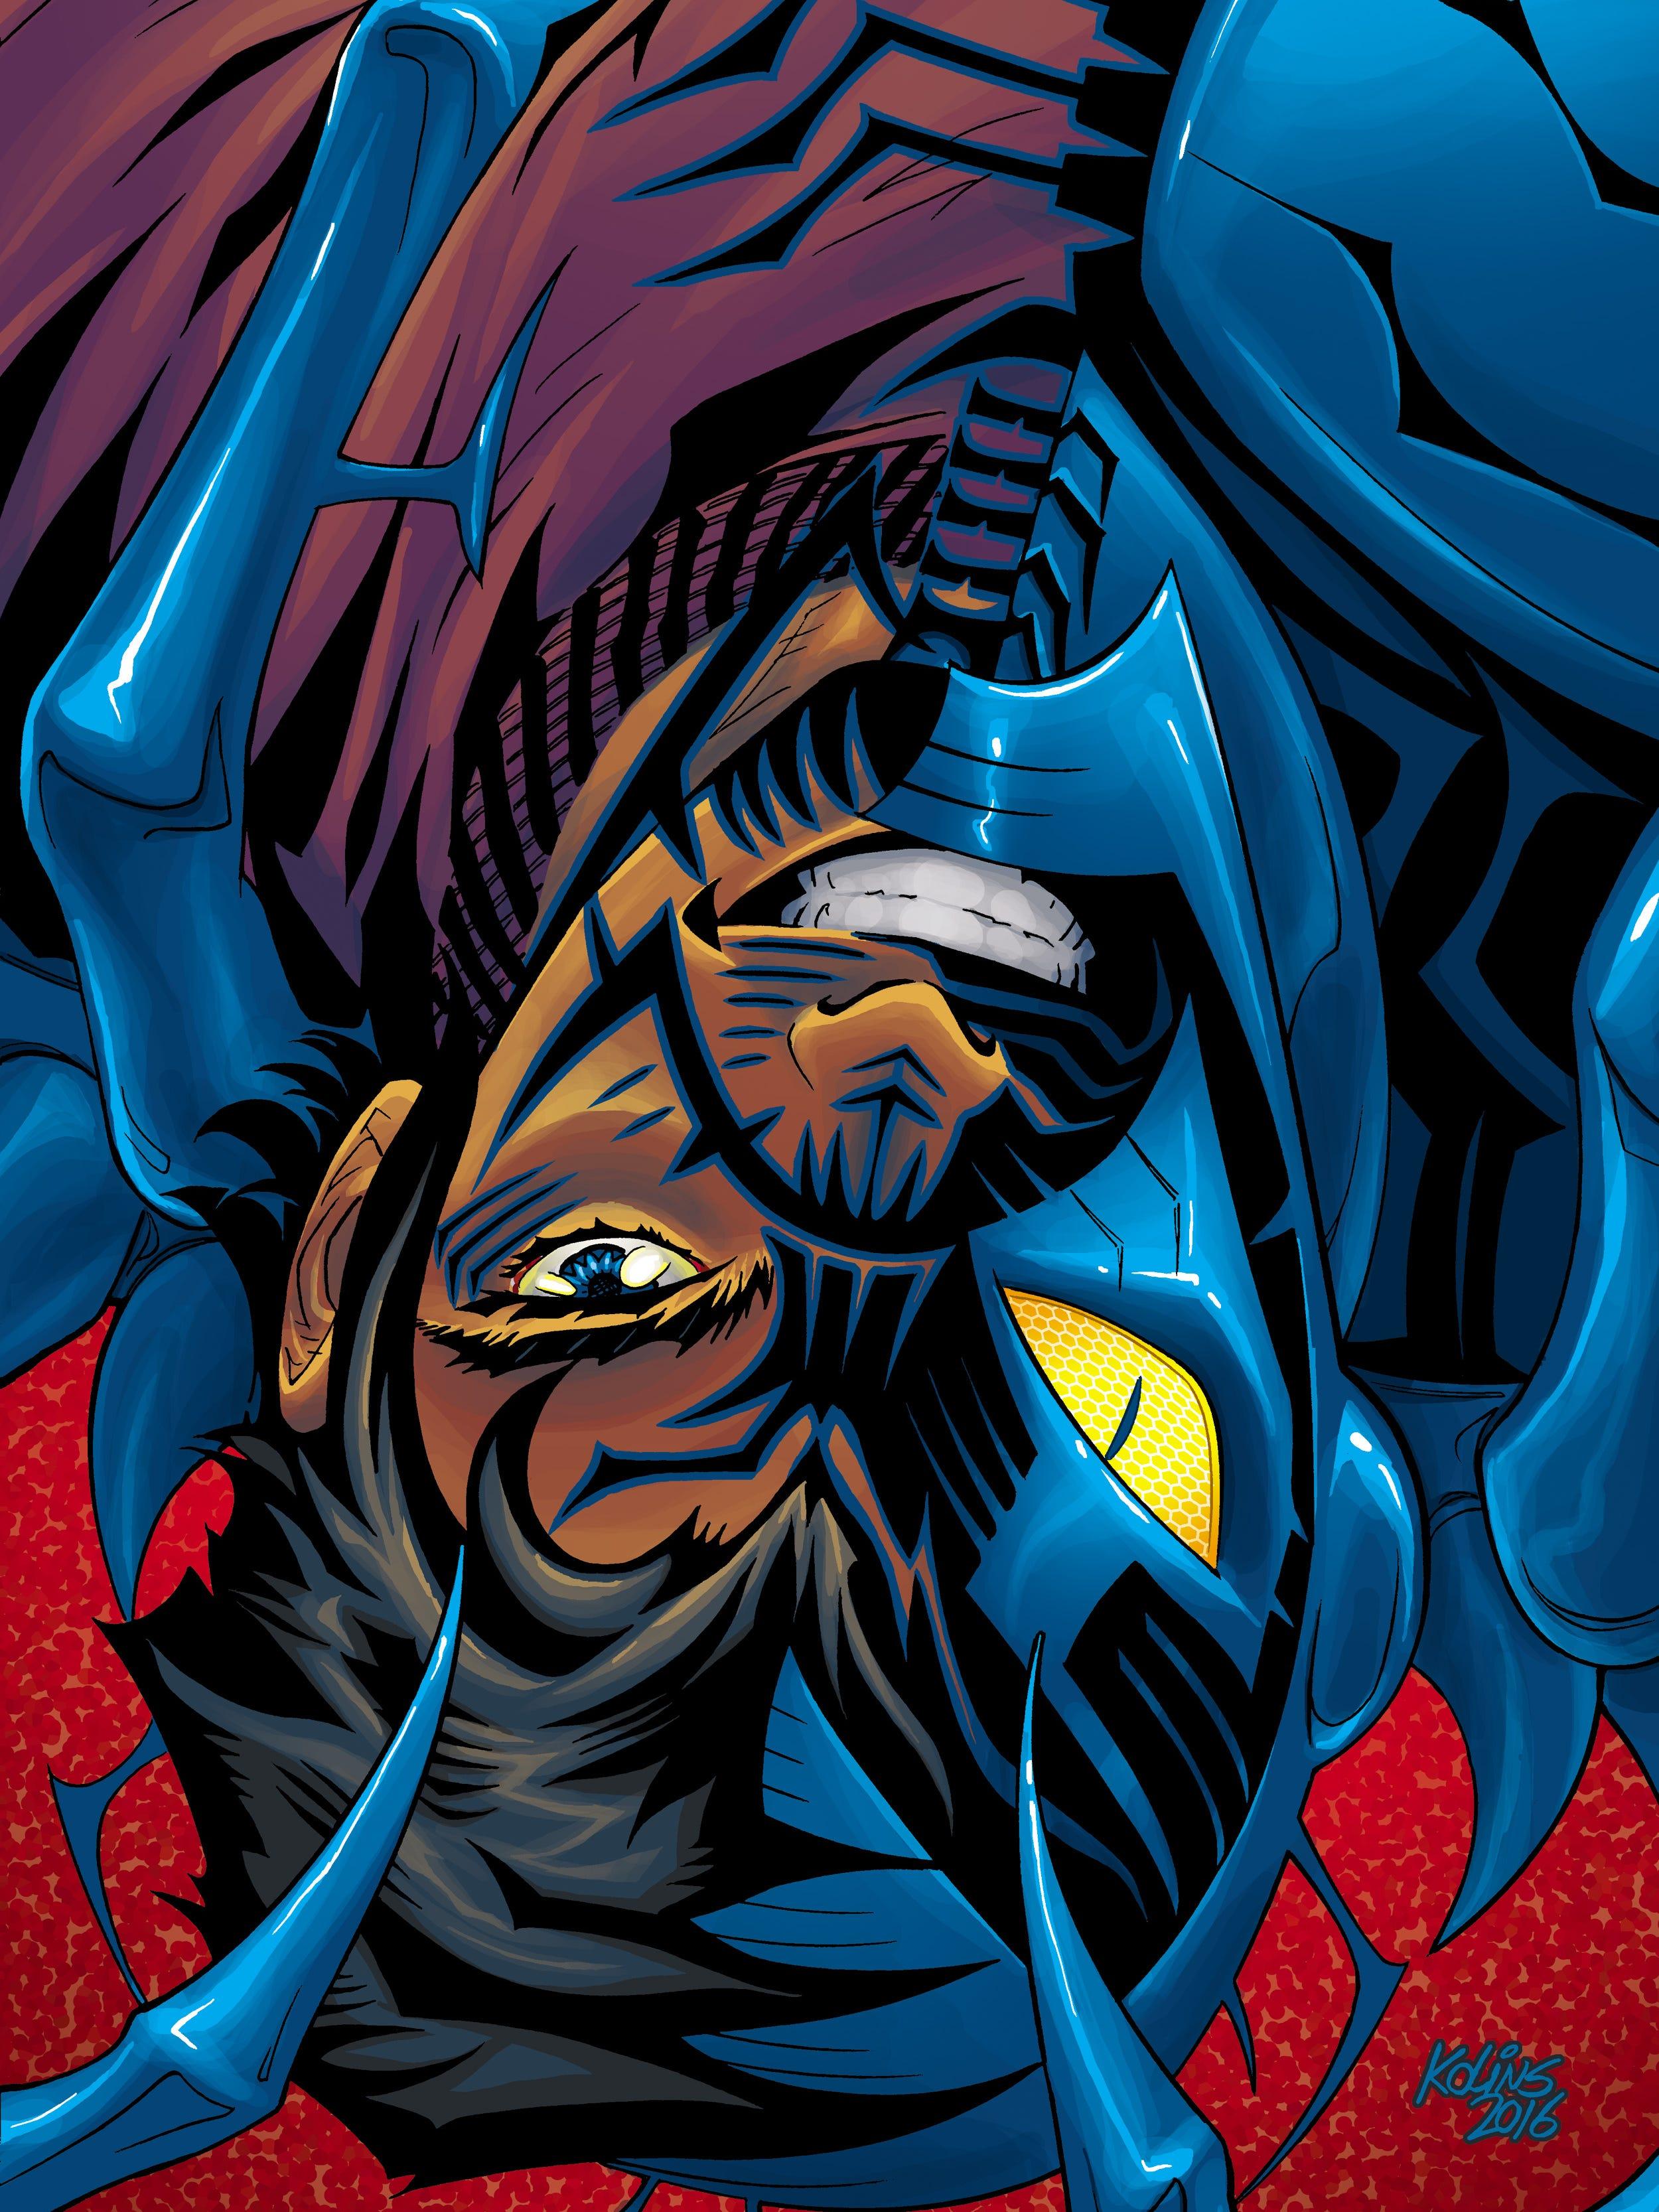 Latino comic superhero Blue Beetle will be from El Paso in film Latino DC comic book superhero Blue Beetle from El Paso in new Warner Bros. film - 웹